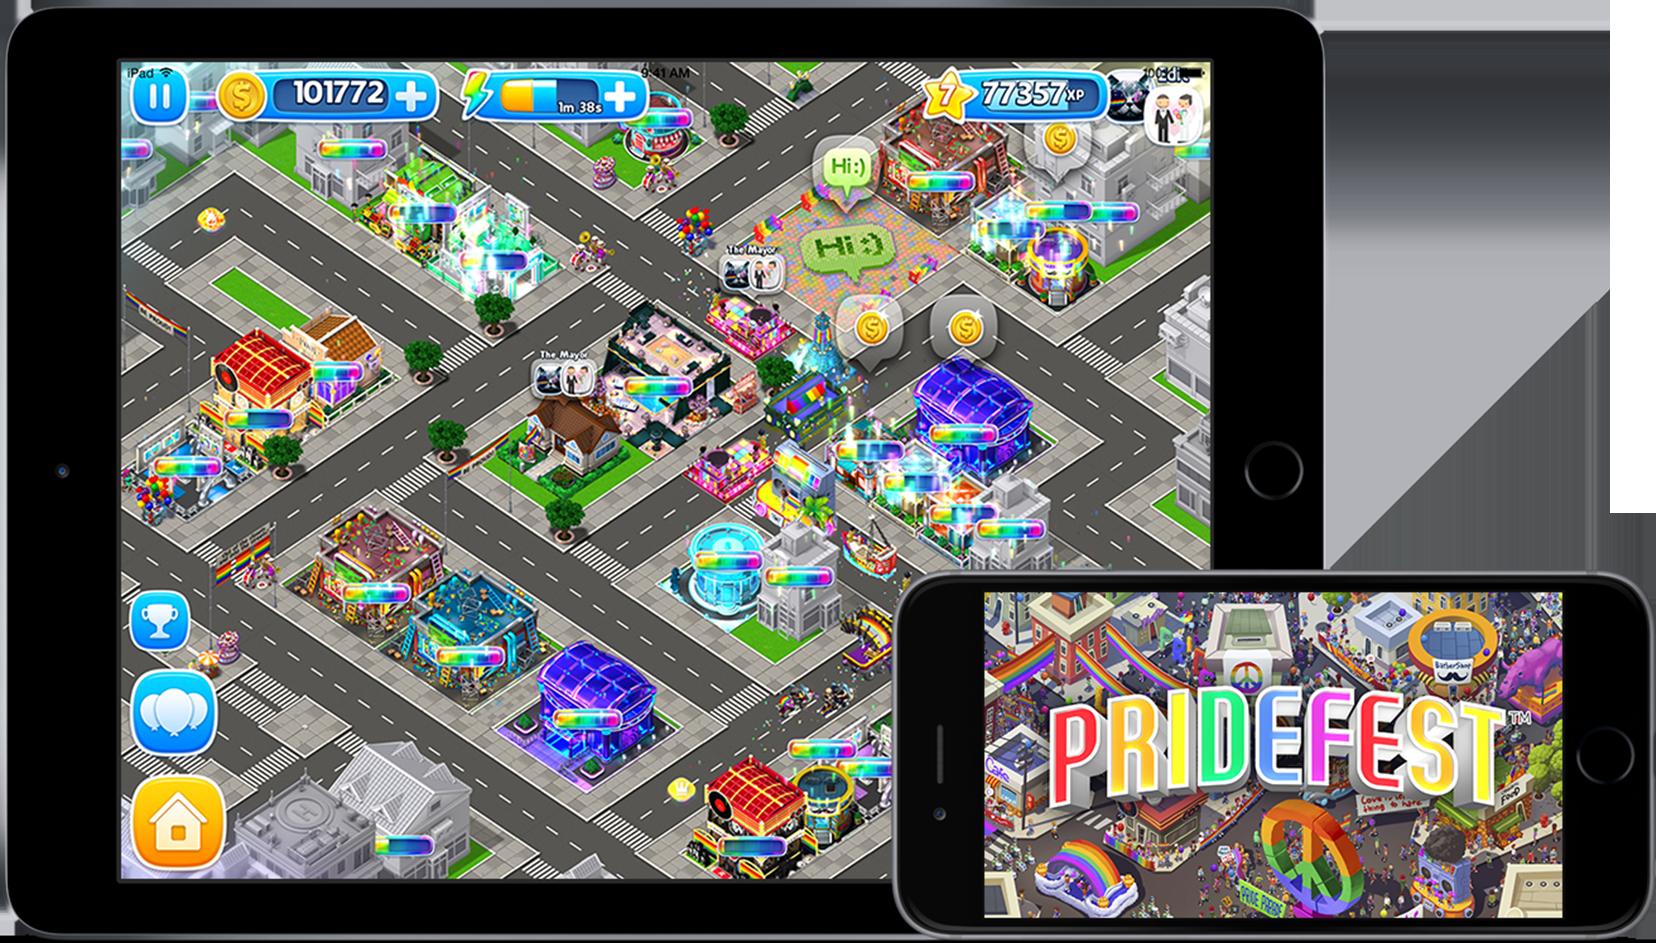 Celebrate the LGBTQ community with Atari's simulation Pridefest